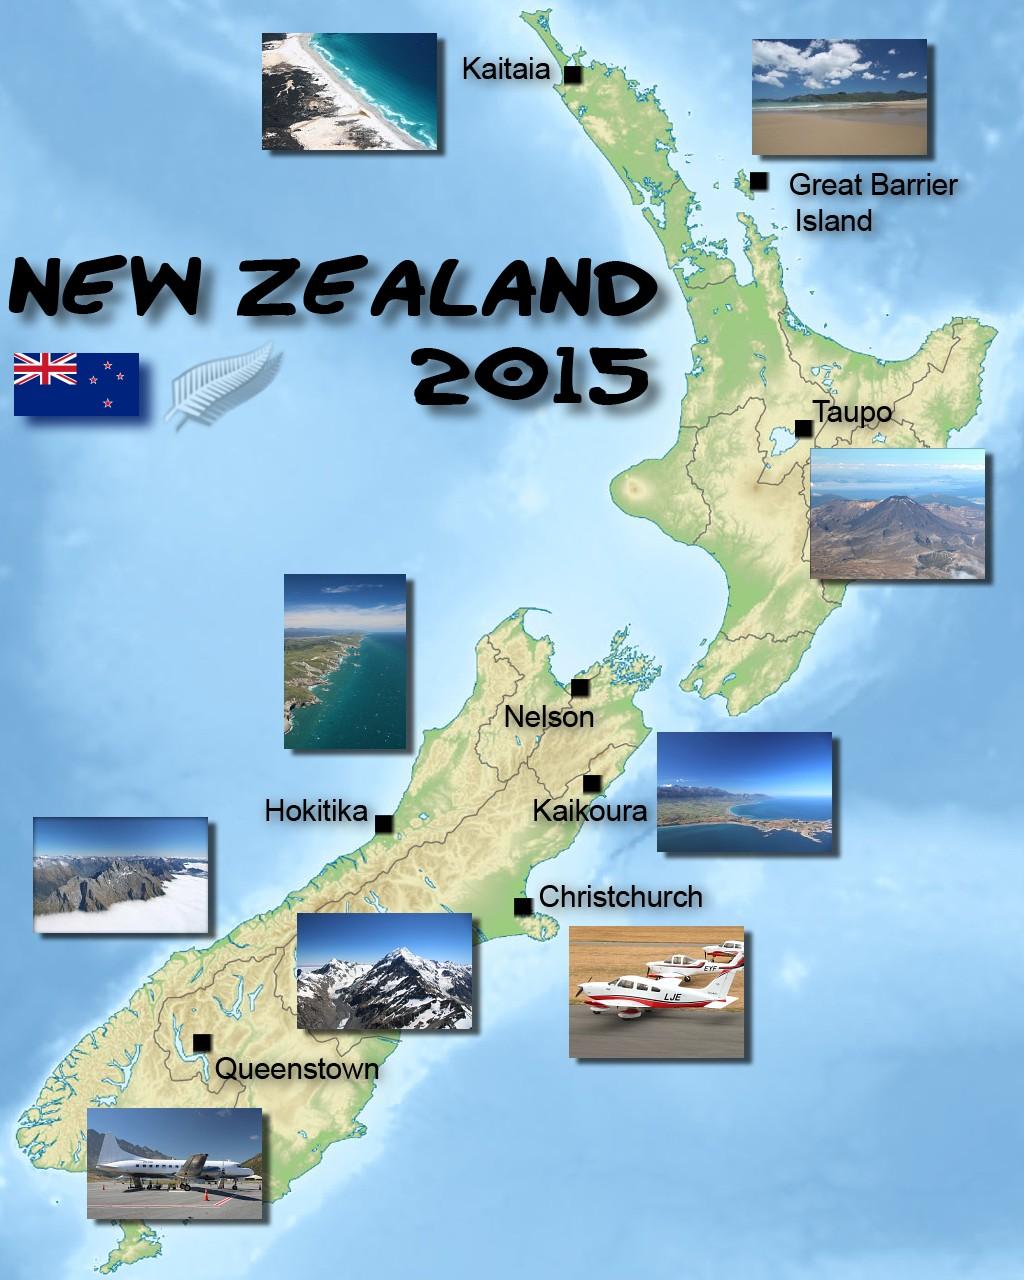 NZ2015_map_01.jpg